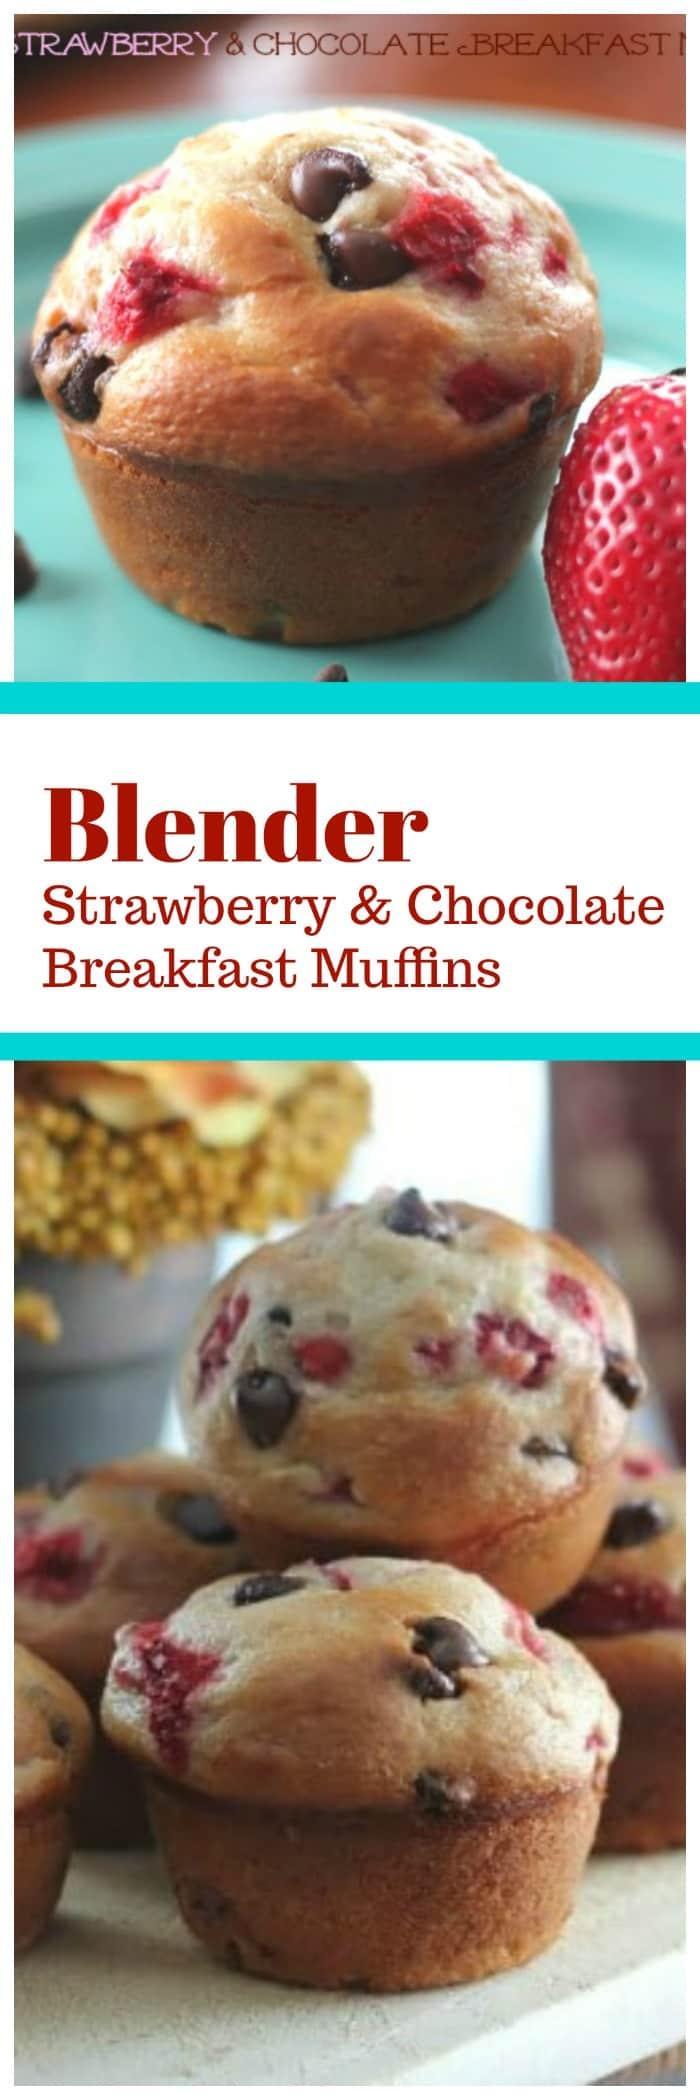 Blender Strawberry & Chocolate Breakfast Muffins {Healthy Too!}